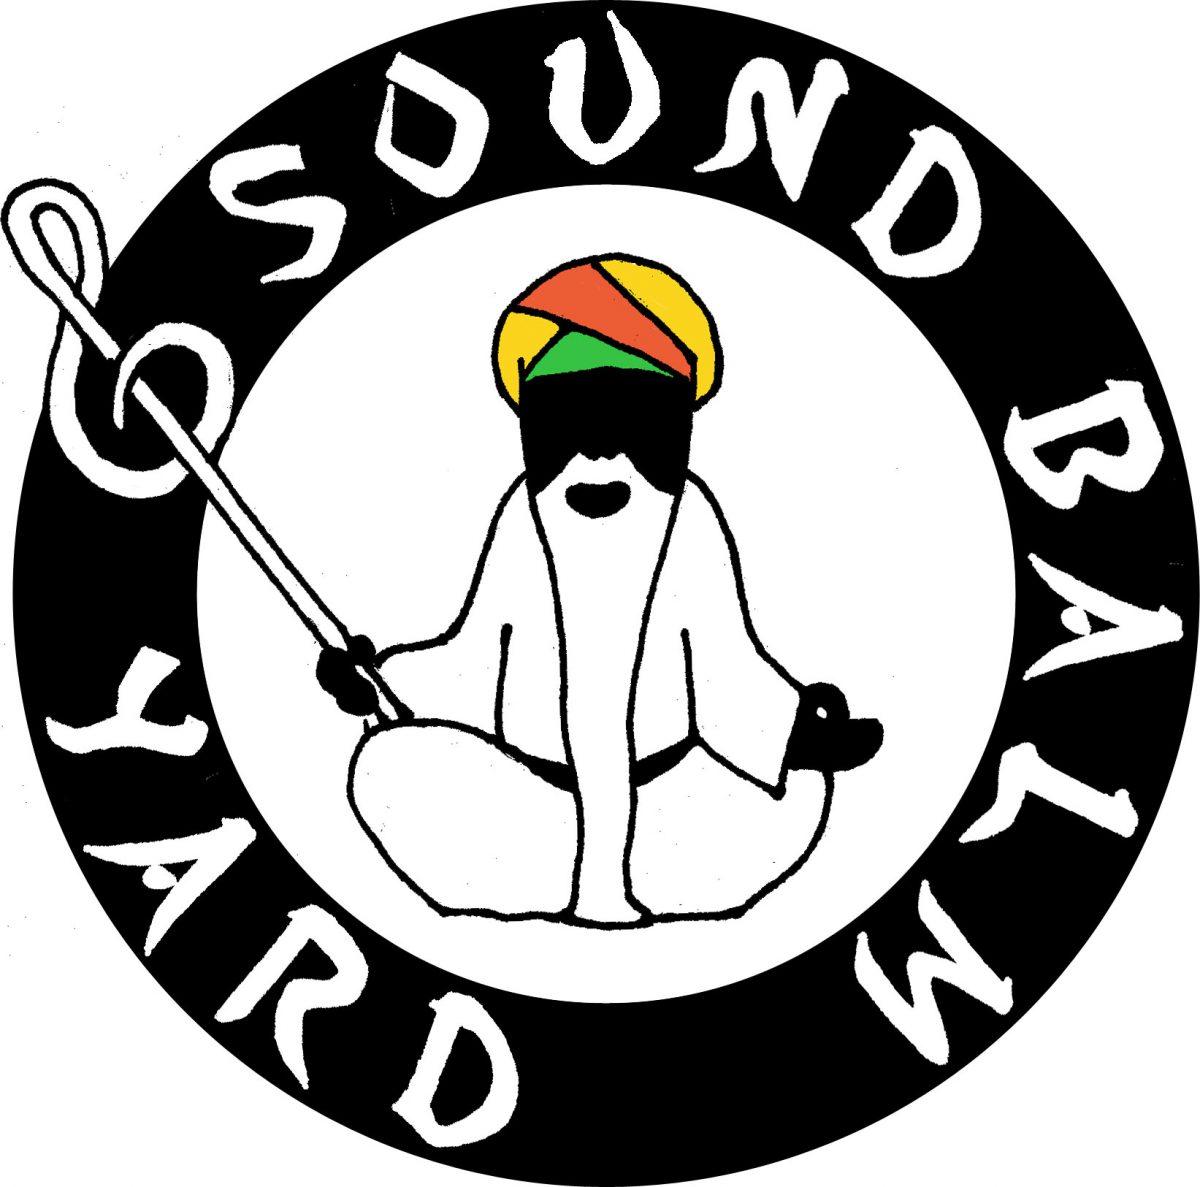 Sound Balm Yard レーベルロゴが決定